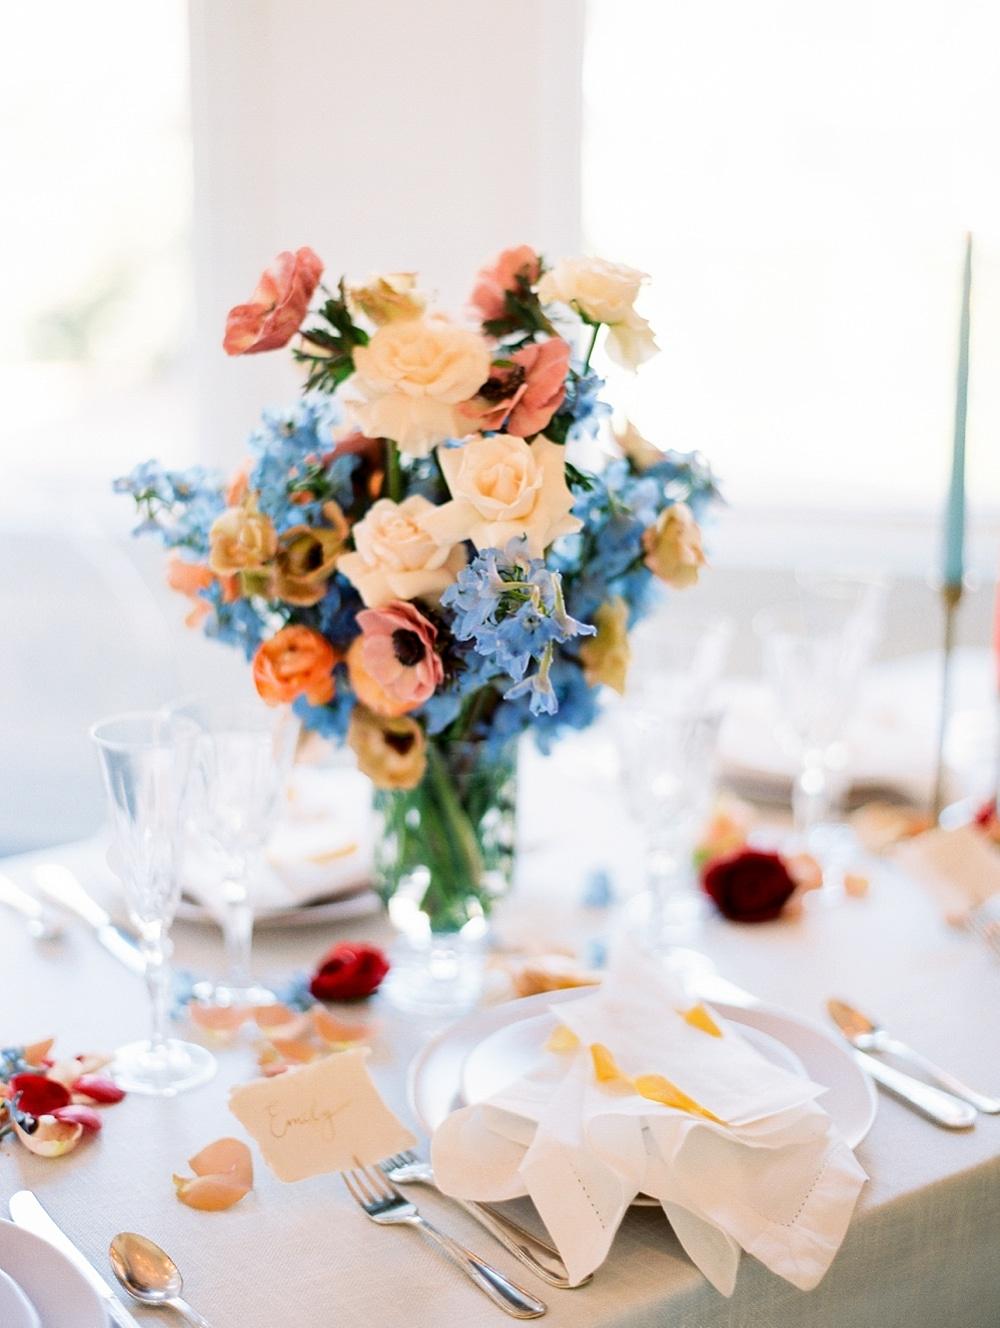 kristin-la-voie-photography-austin-wedding-photographer-woodbine-mansion-102